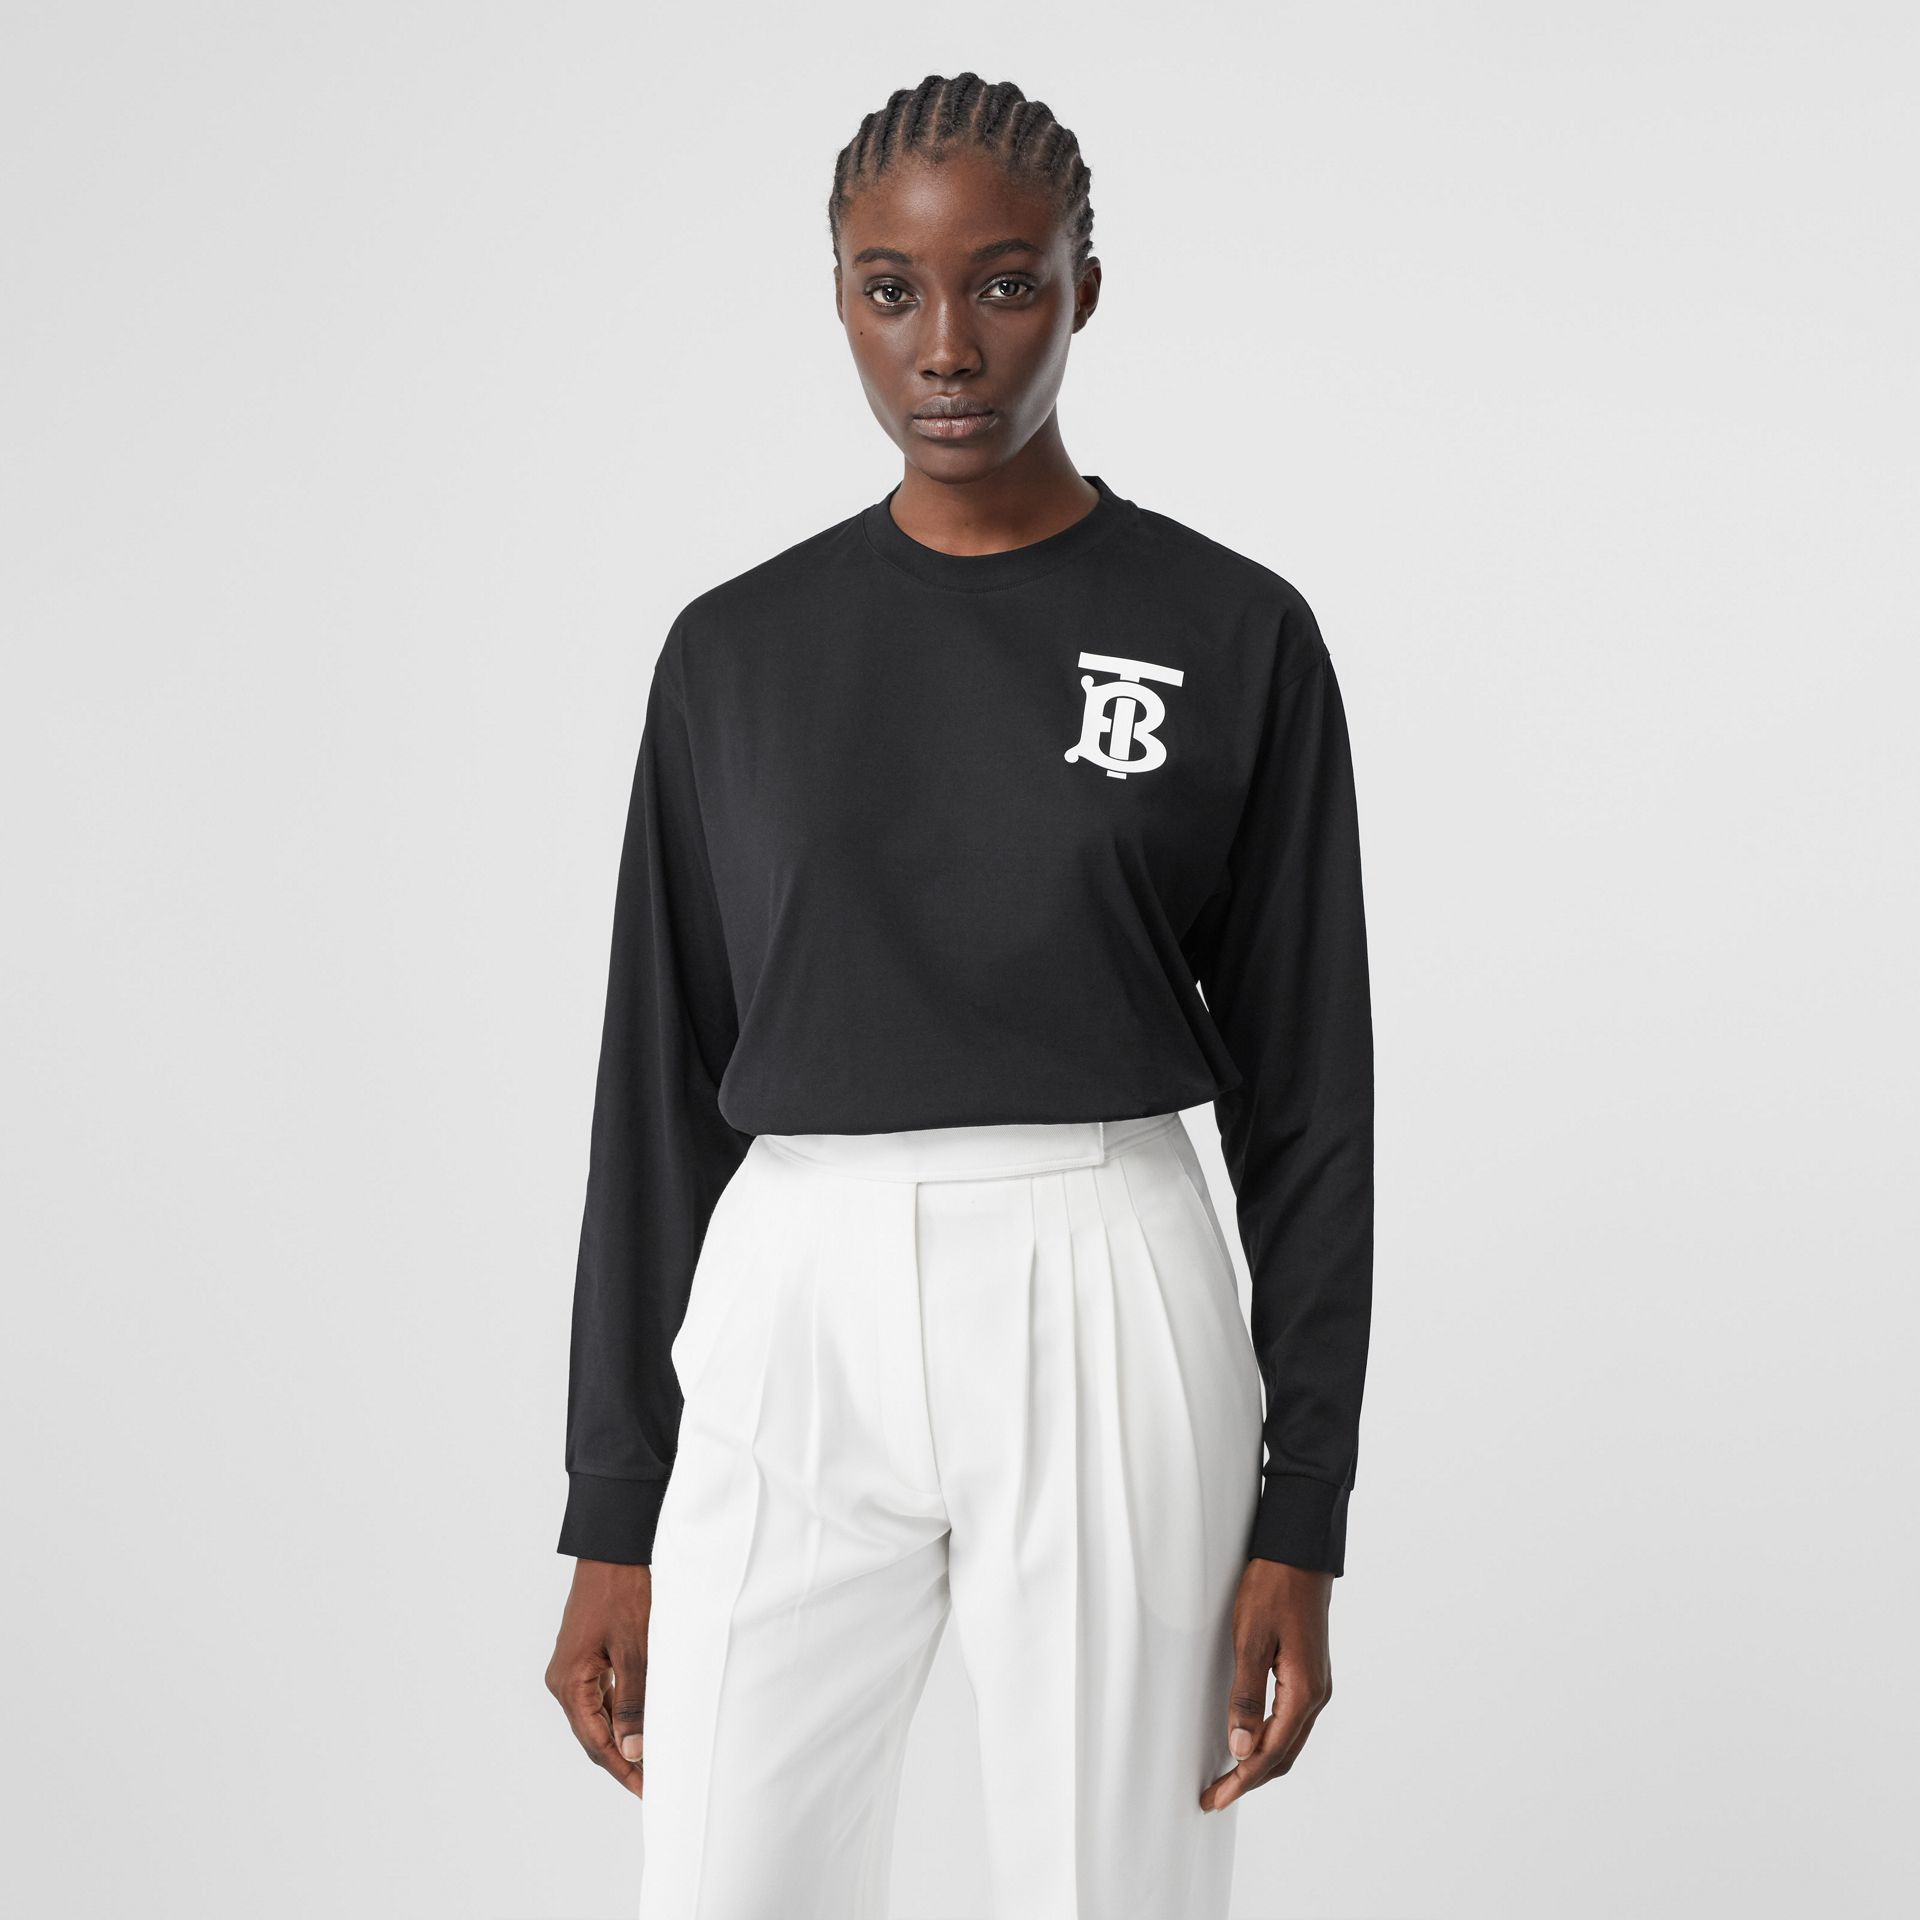 Long-sleeve Monogram Motif Cotton Top in Black - Women | Burberry - gallery image 4